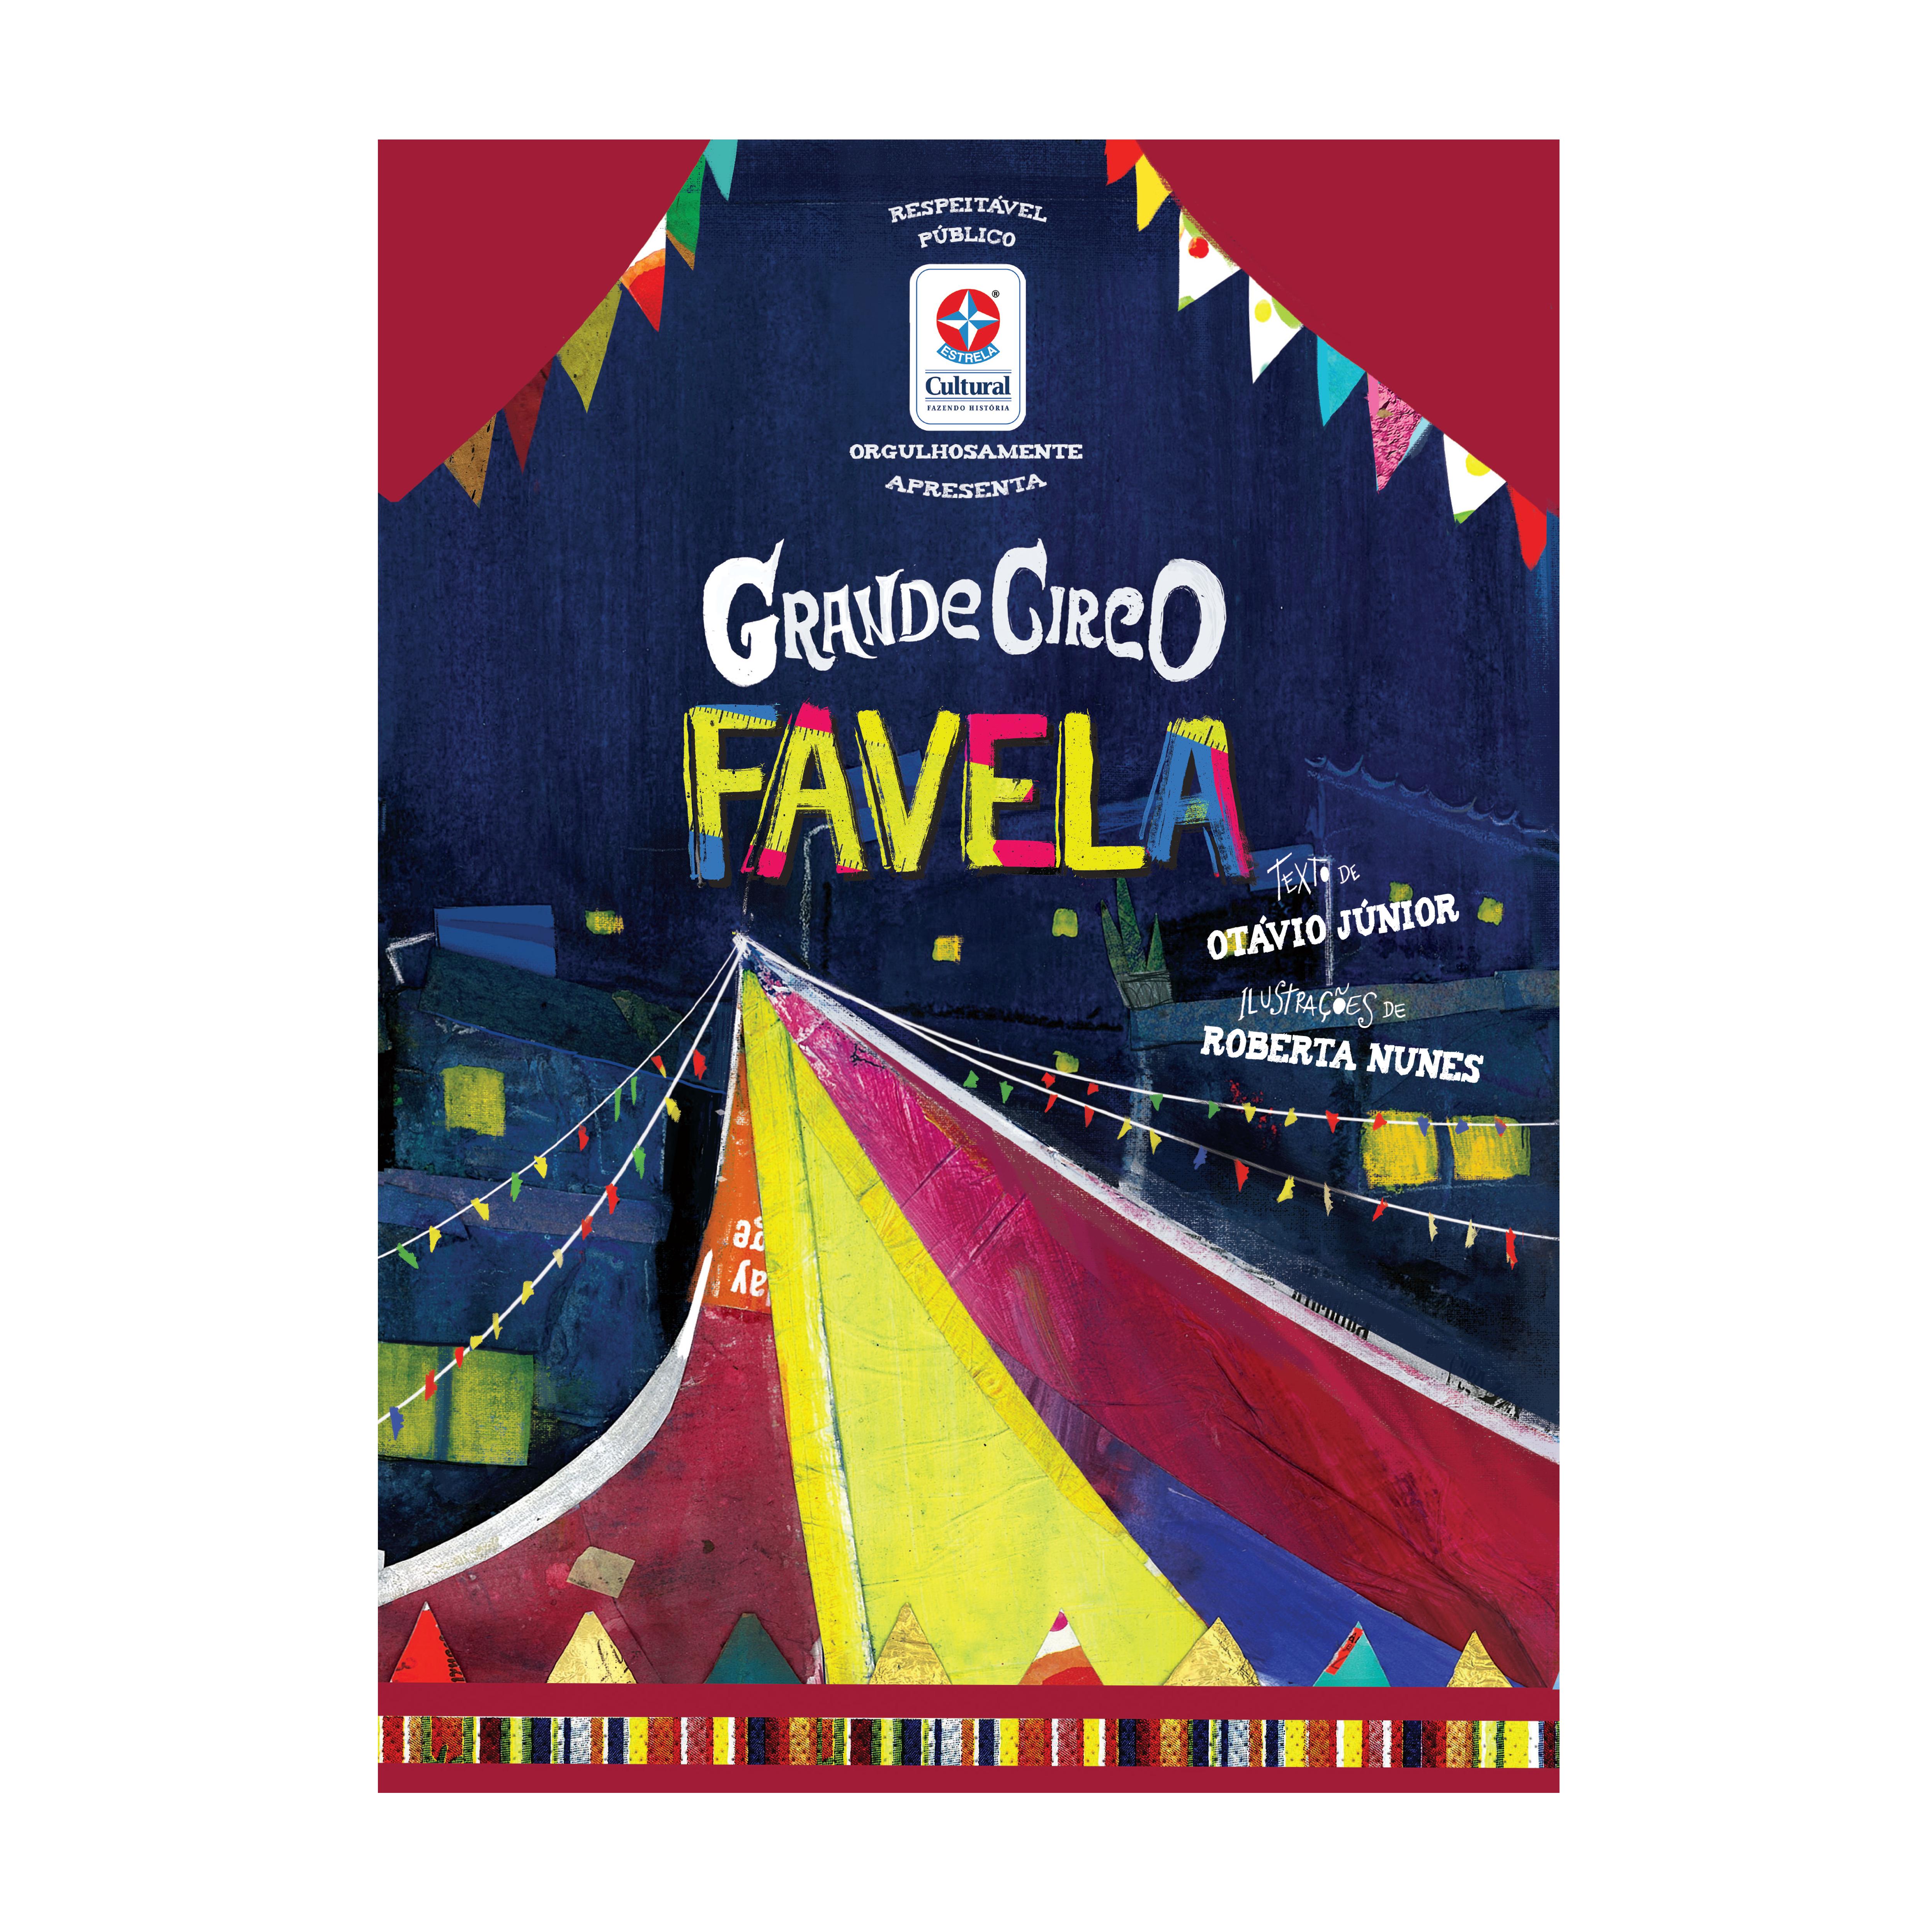 grande-circo-favela-estrela-cultural